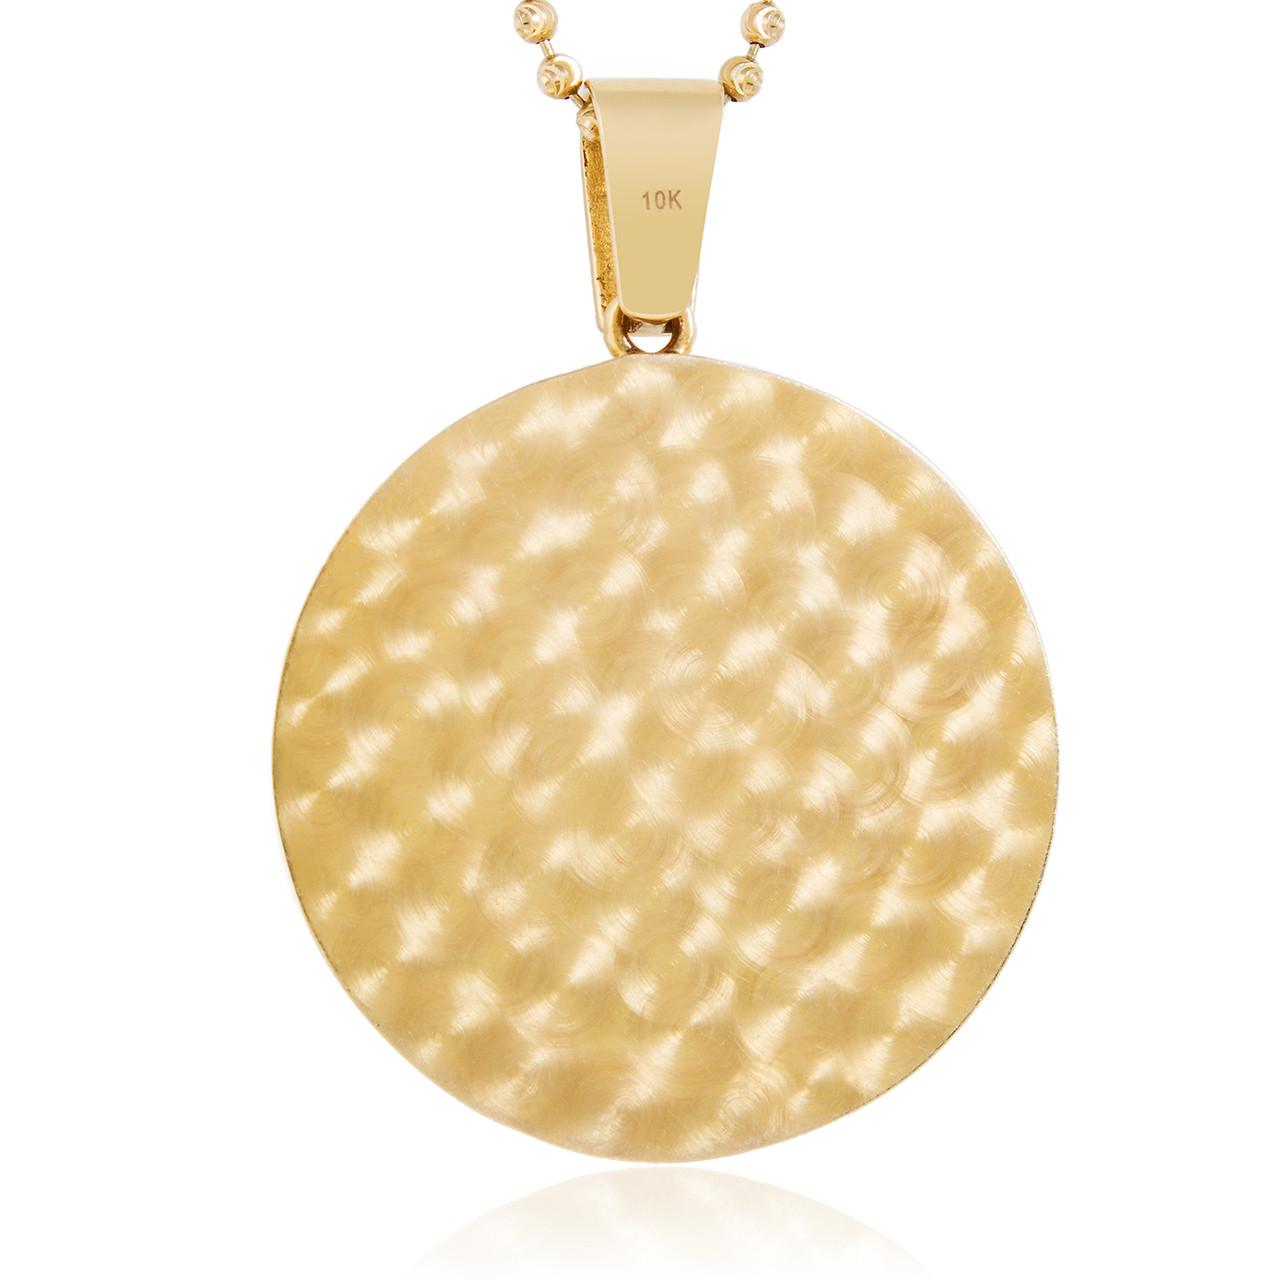 14k Yellow Gold 3.25ct Large Round Jesus Pendant - Shyne Jewelers c229be7124